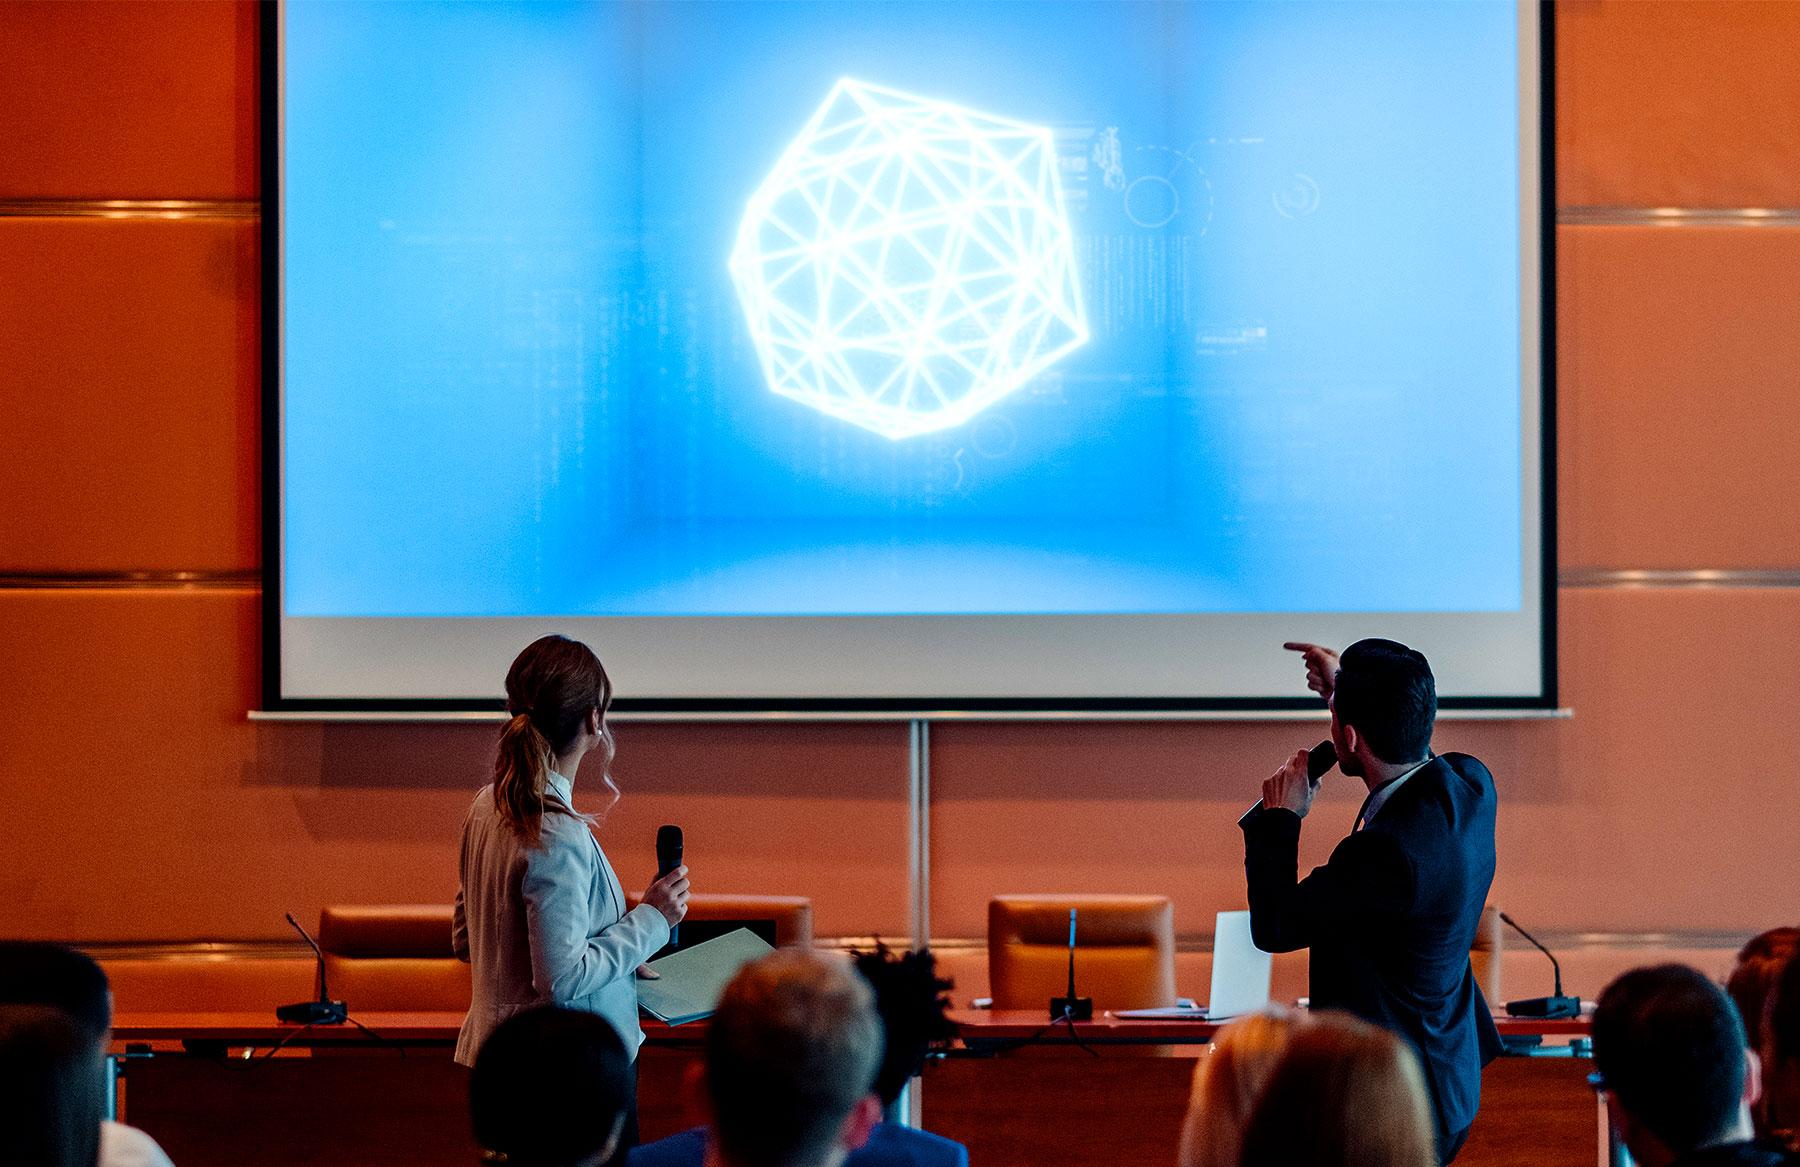 2020 Presentation Design Trends